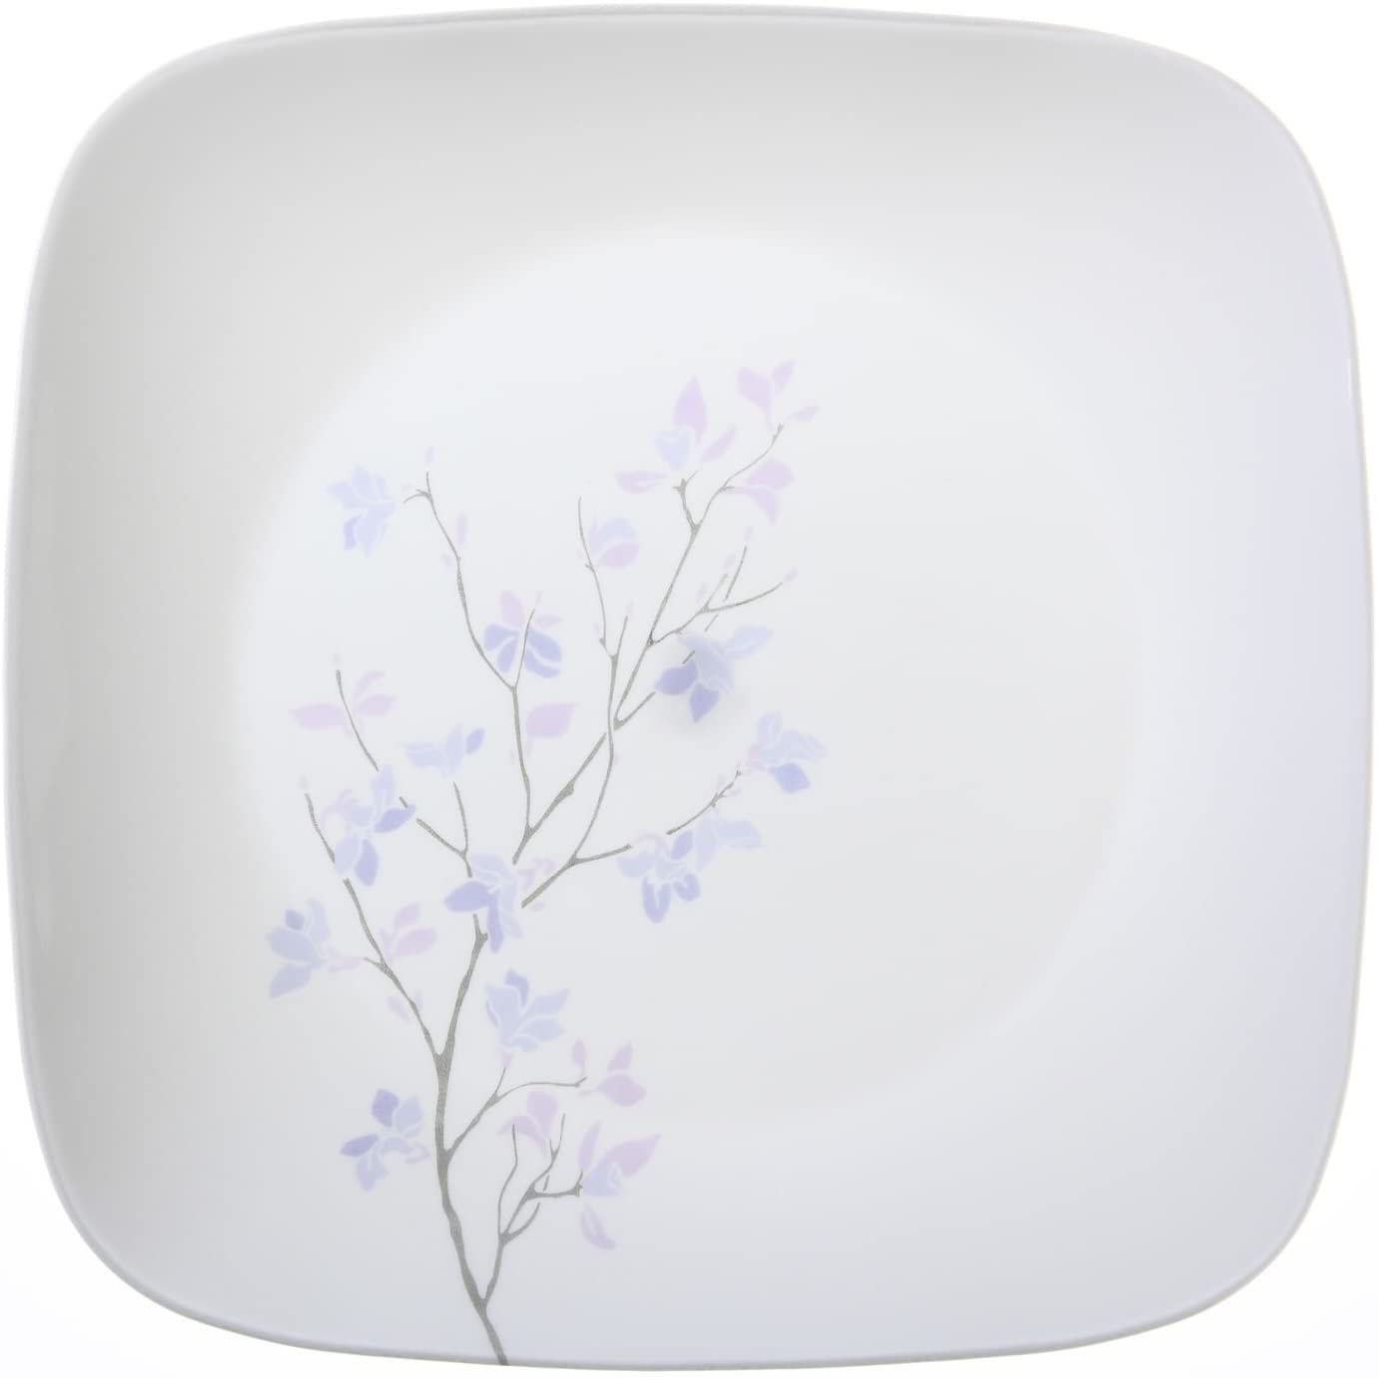 | Corelle Square Splendor 10-1/4-Inch Plate Set (6-Piece): Dinnerware Sets